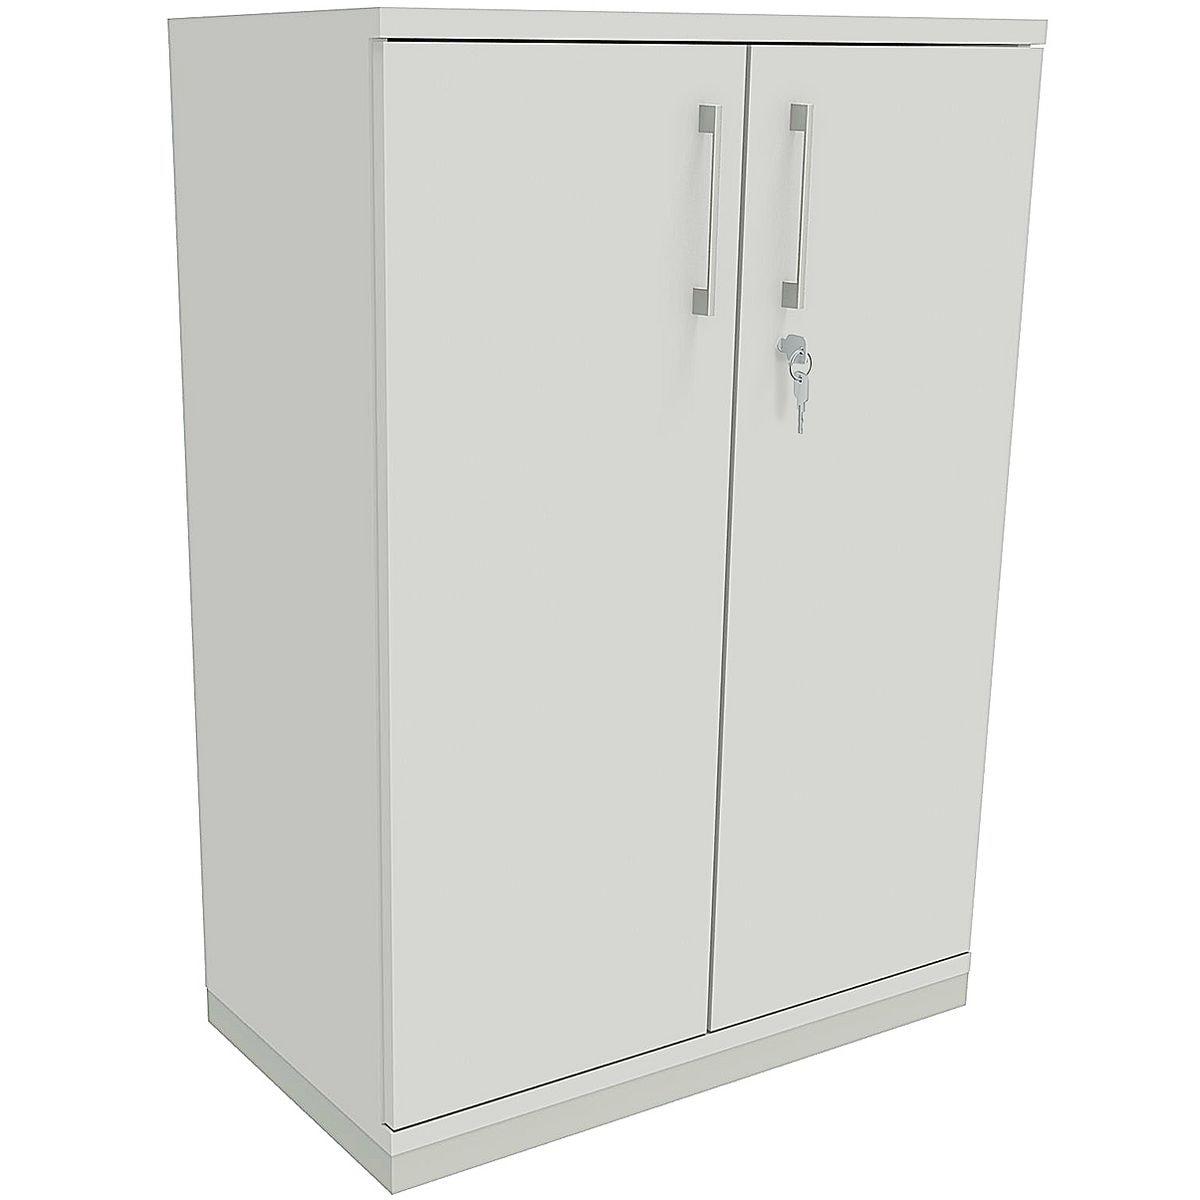 fm b rom bel aktenschrank oldenburg 3 oh 80 cm bei otto office g nstig kaufen. Black Bedroom Furniture Sets. Home Design Ideas